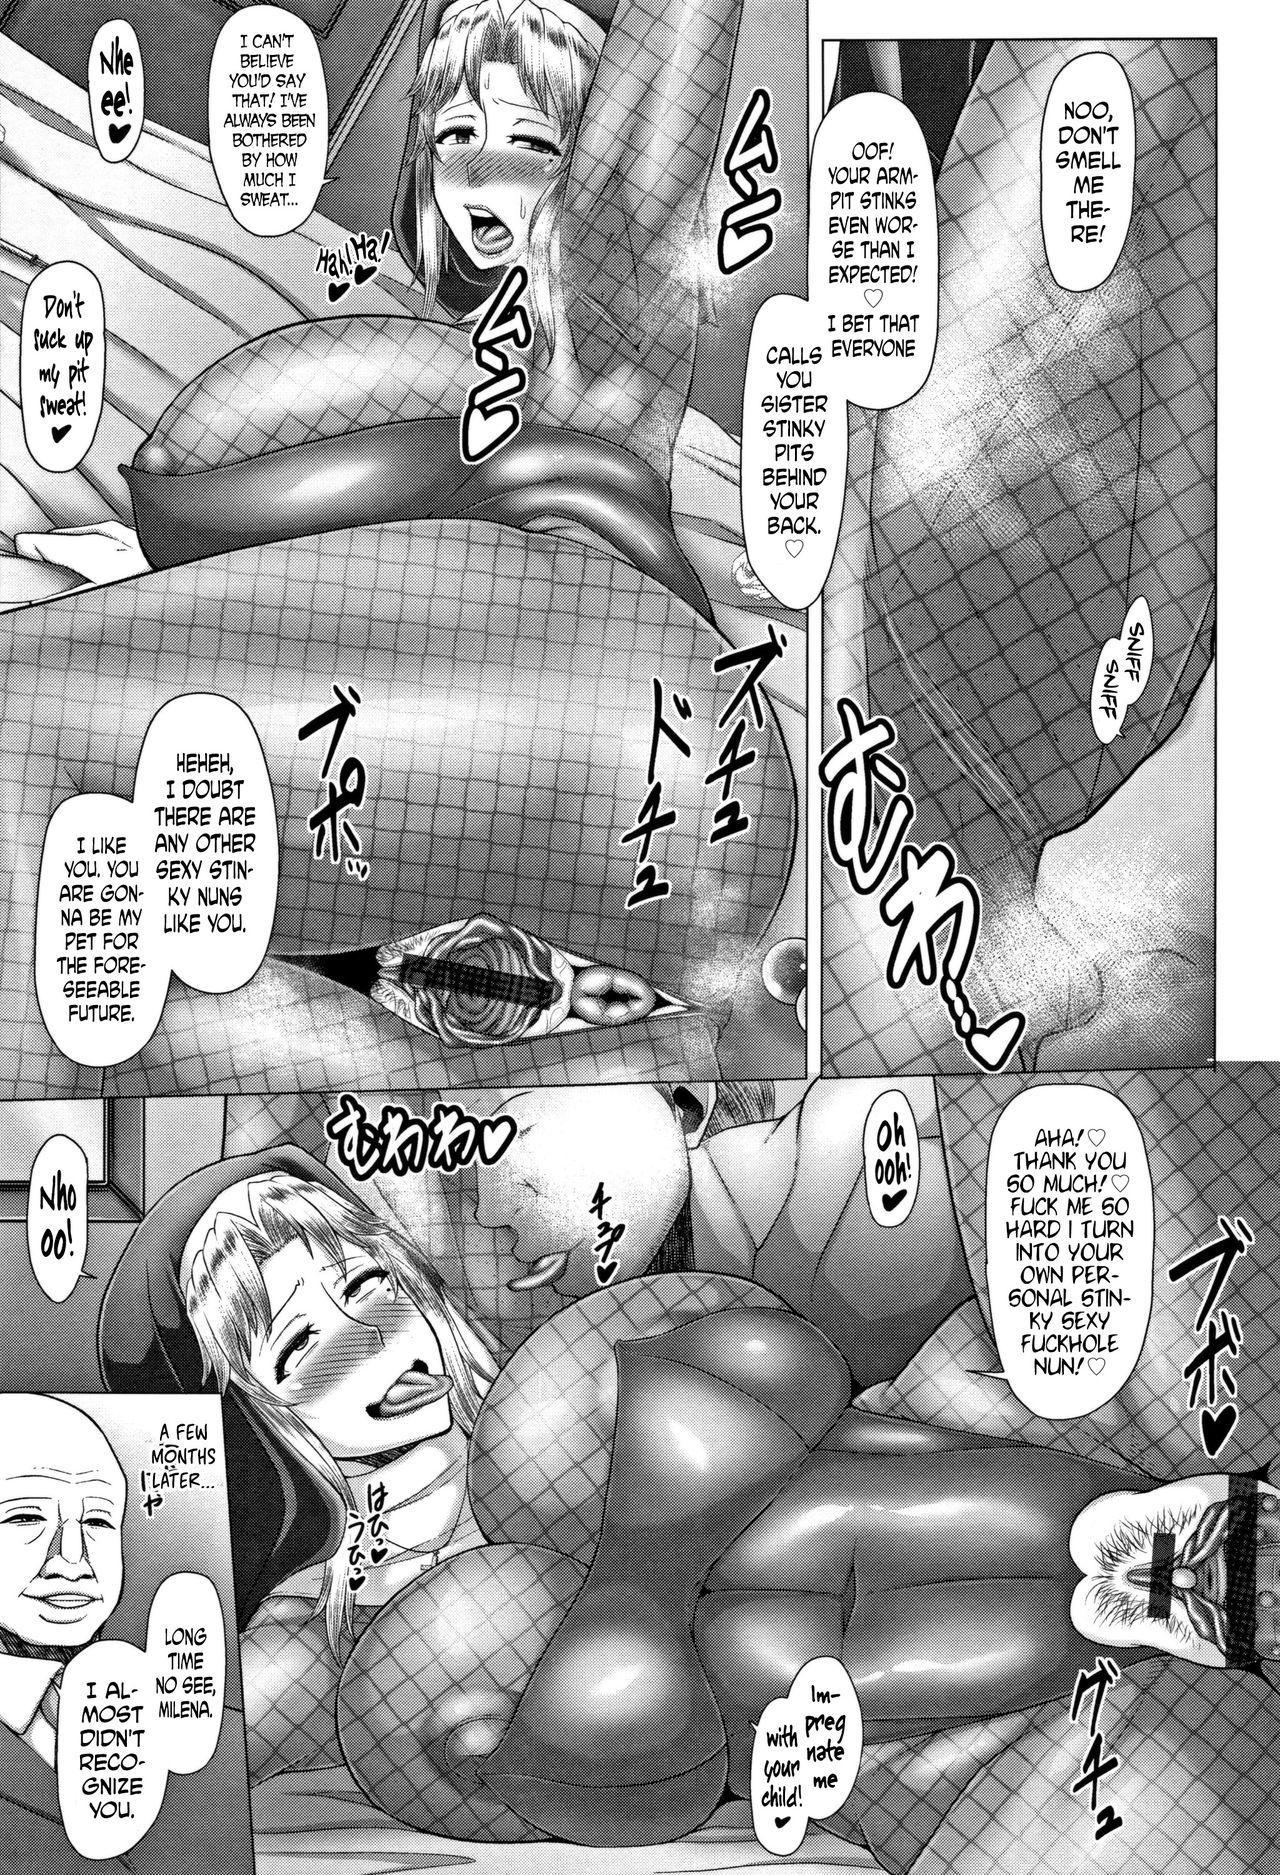 [Inoue Nanaki] Joushiki Daha! Kuro Gal Bitch-ka Seikatsu Ch. 1-3, 5-8 [English] [Dark Mac + N04h] 56